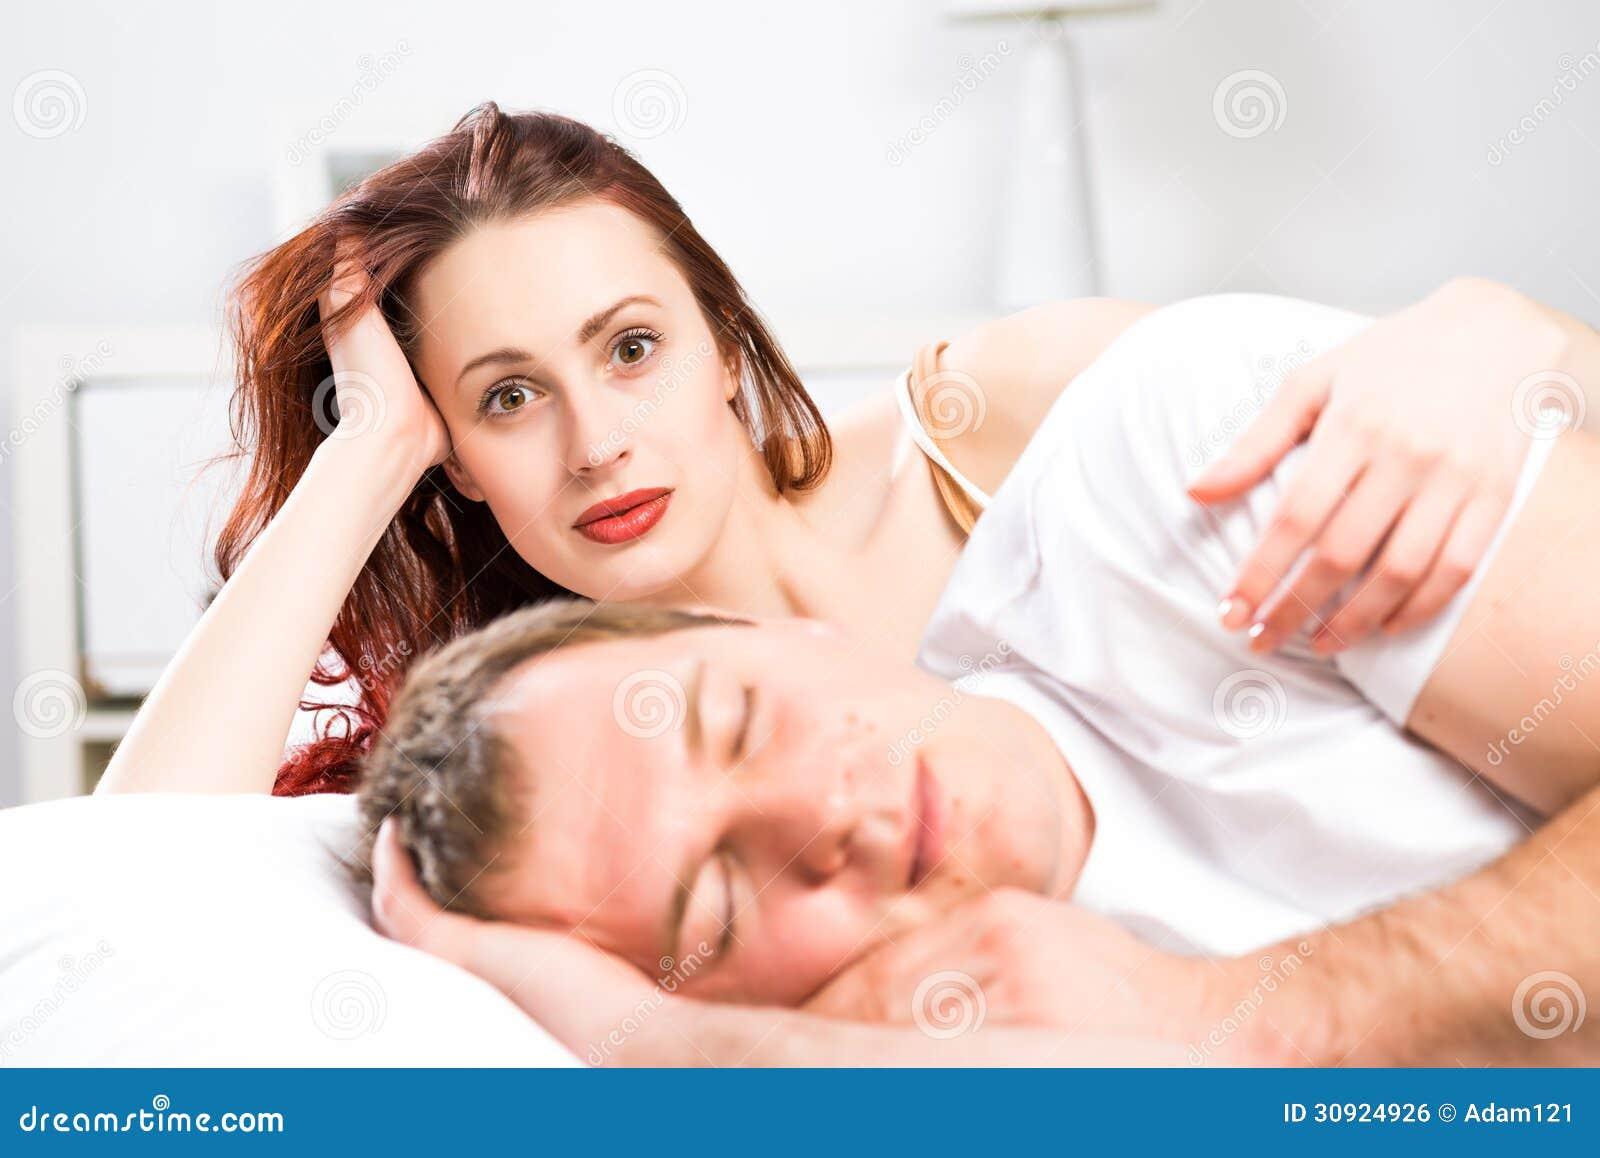 spouse relationship problems